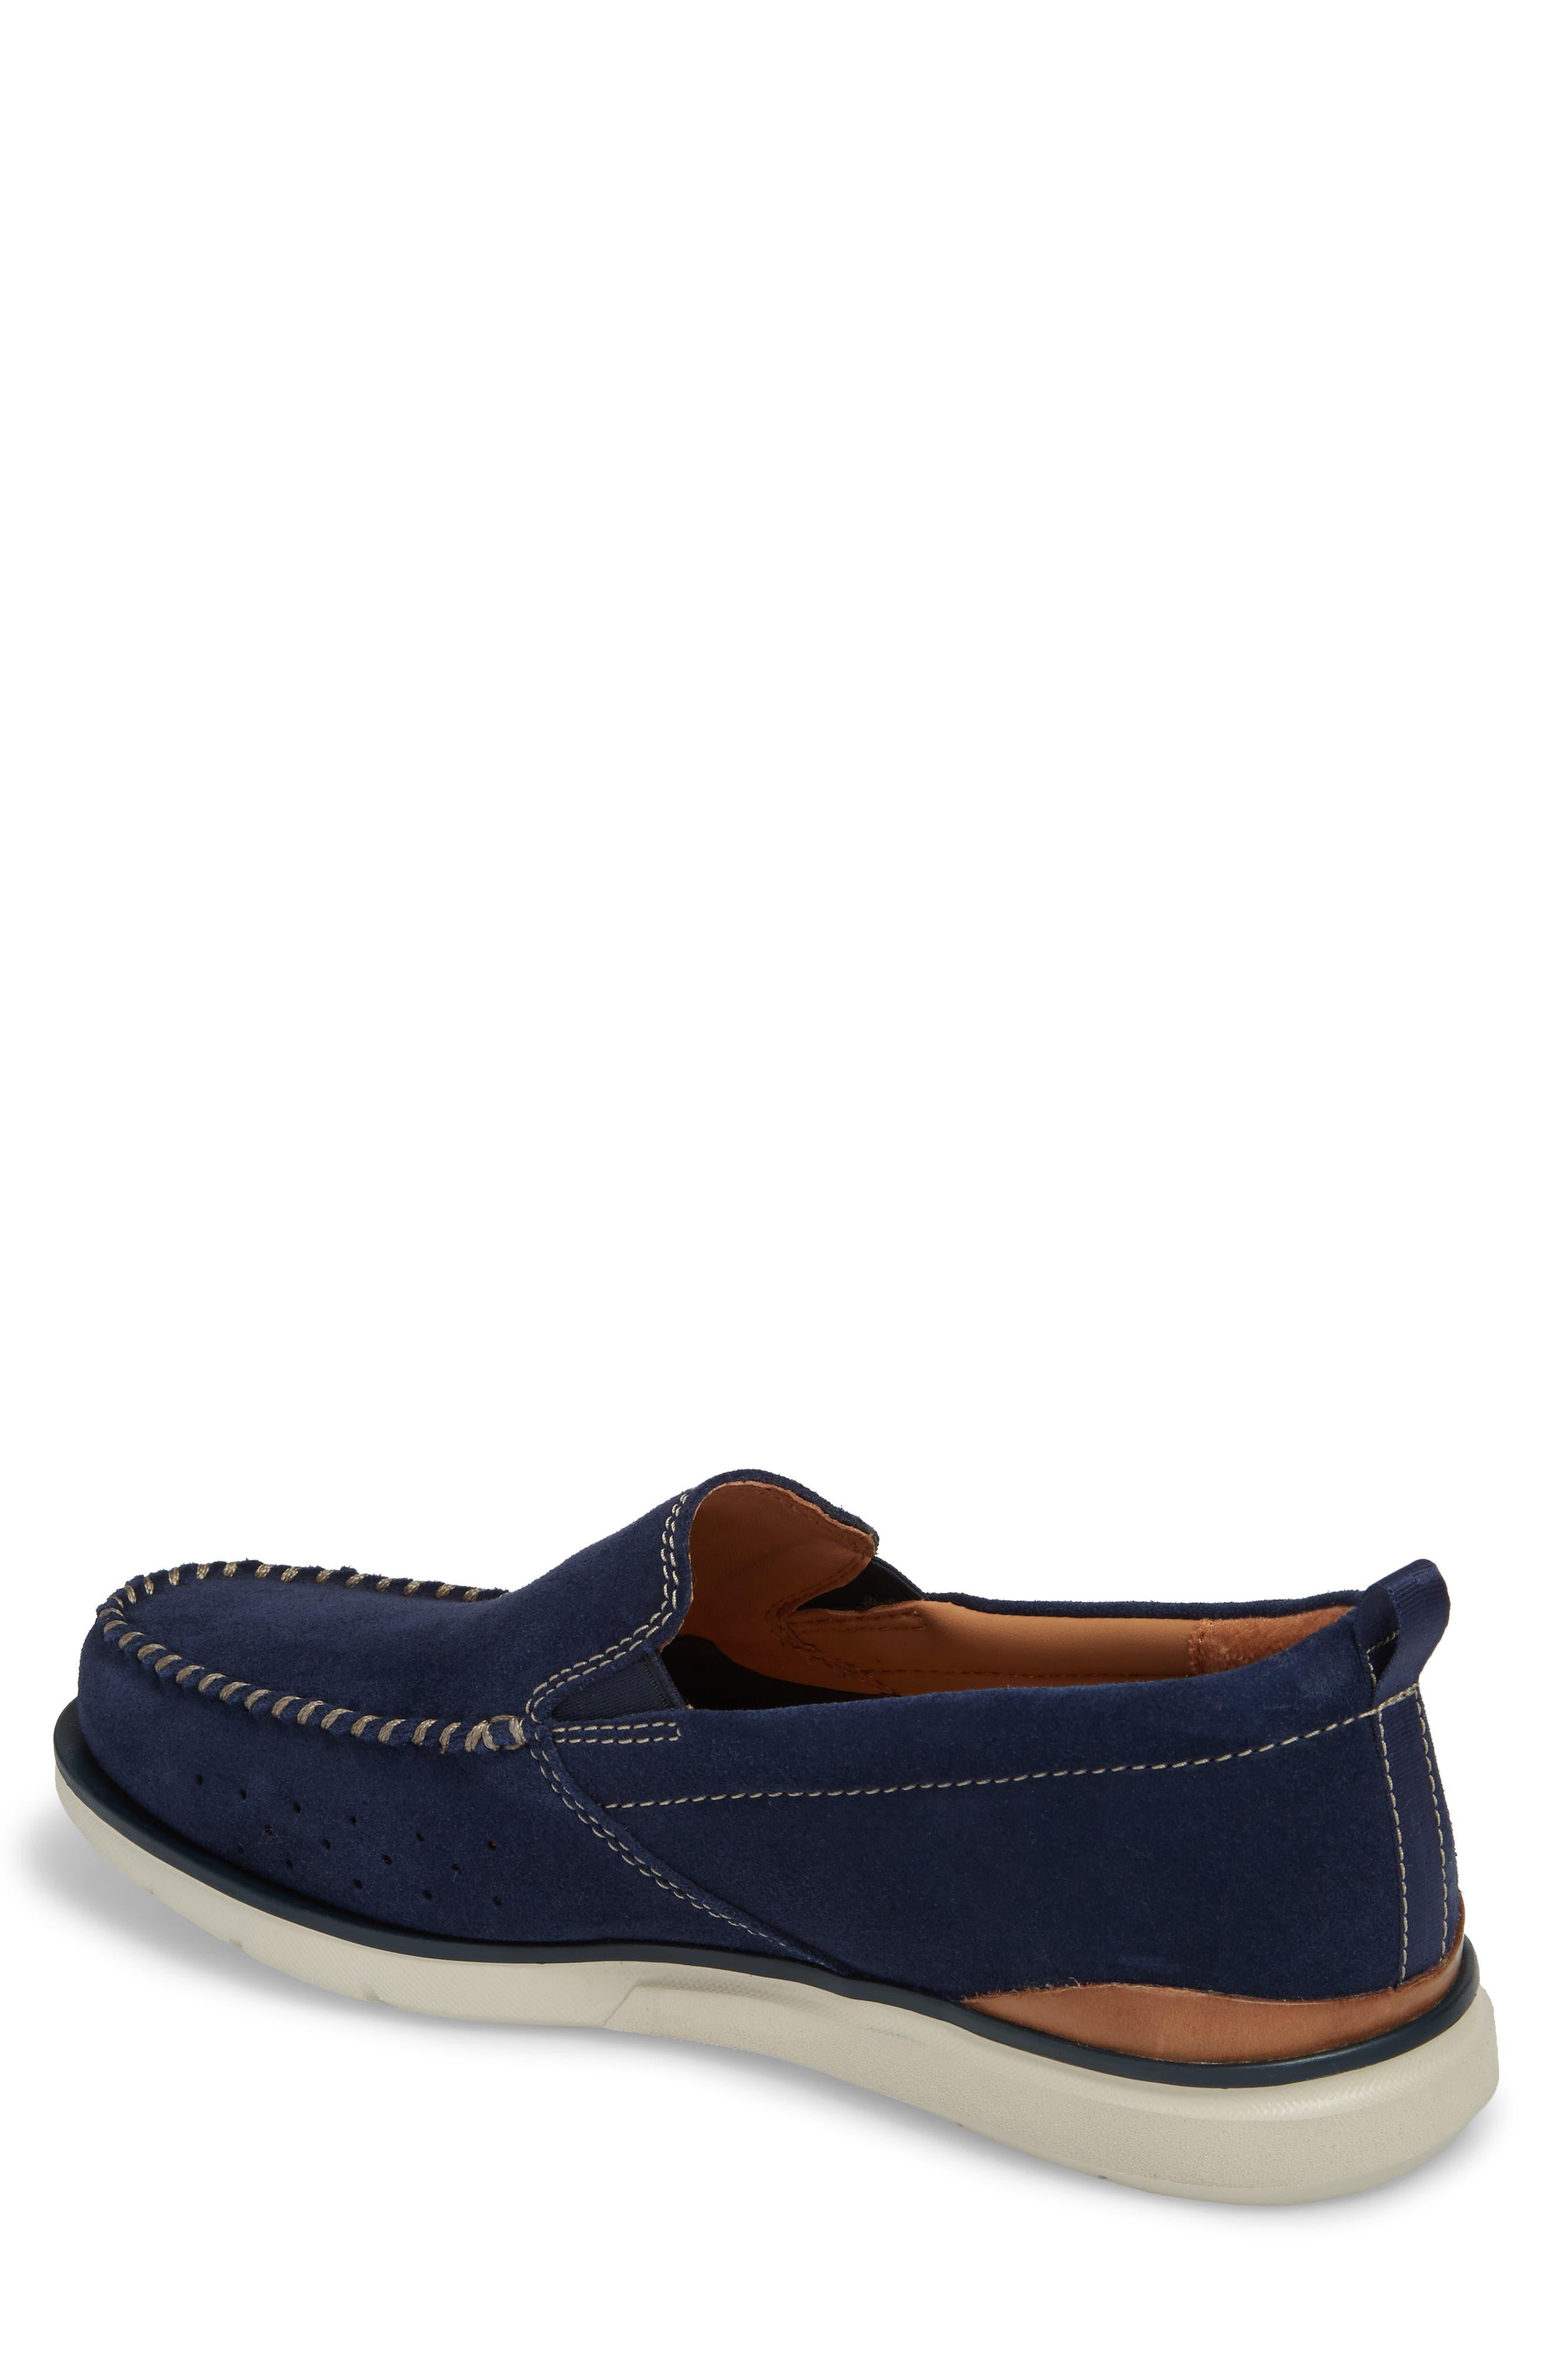 Edgewood Step Moc Toe Loafer,                             Alternate thumbnail 2, color,                             Blue Suede